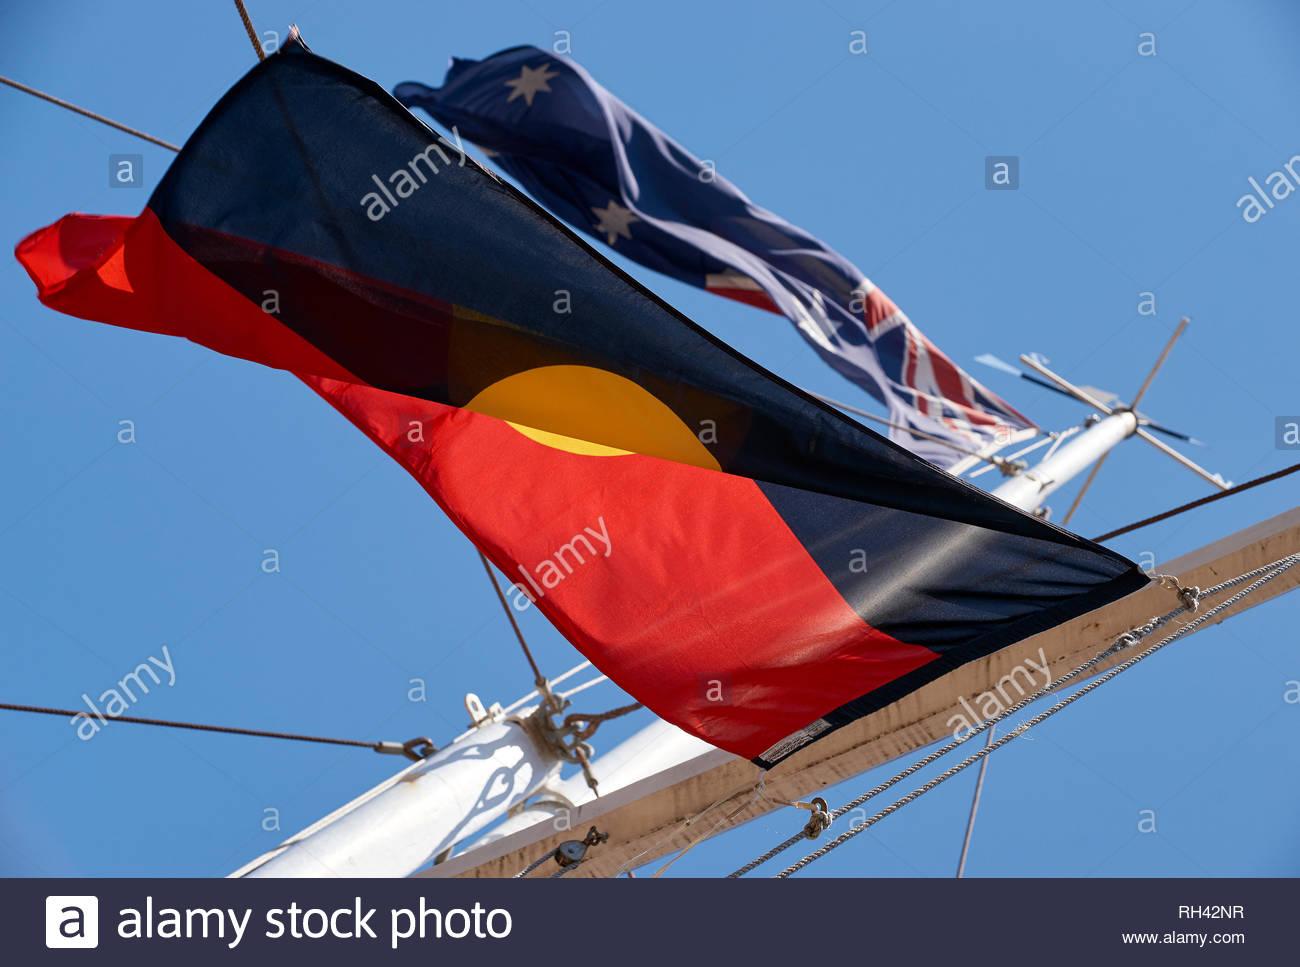 An Australian flag flies symbolically, high above an Aboriginal flag, on a white flagpole; on Australia Day / Invasion Day in Yamba, NSW, Australia. - Stock Image